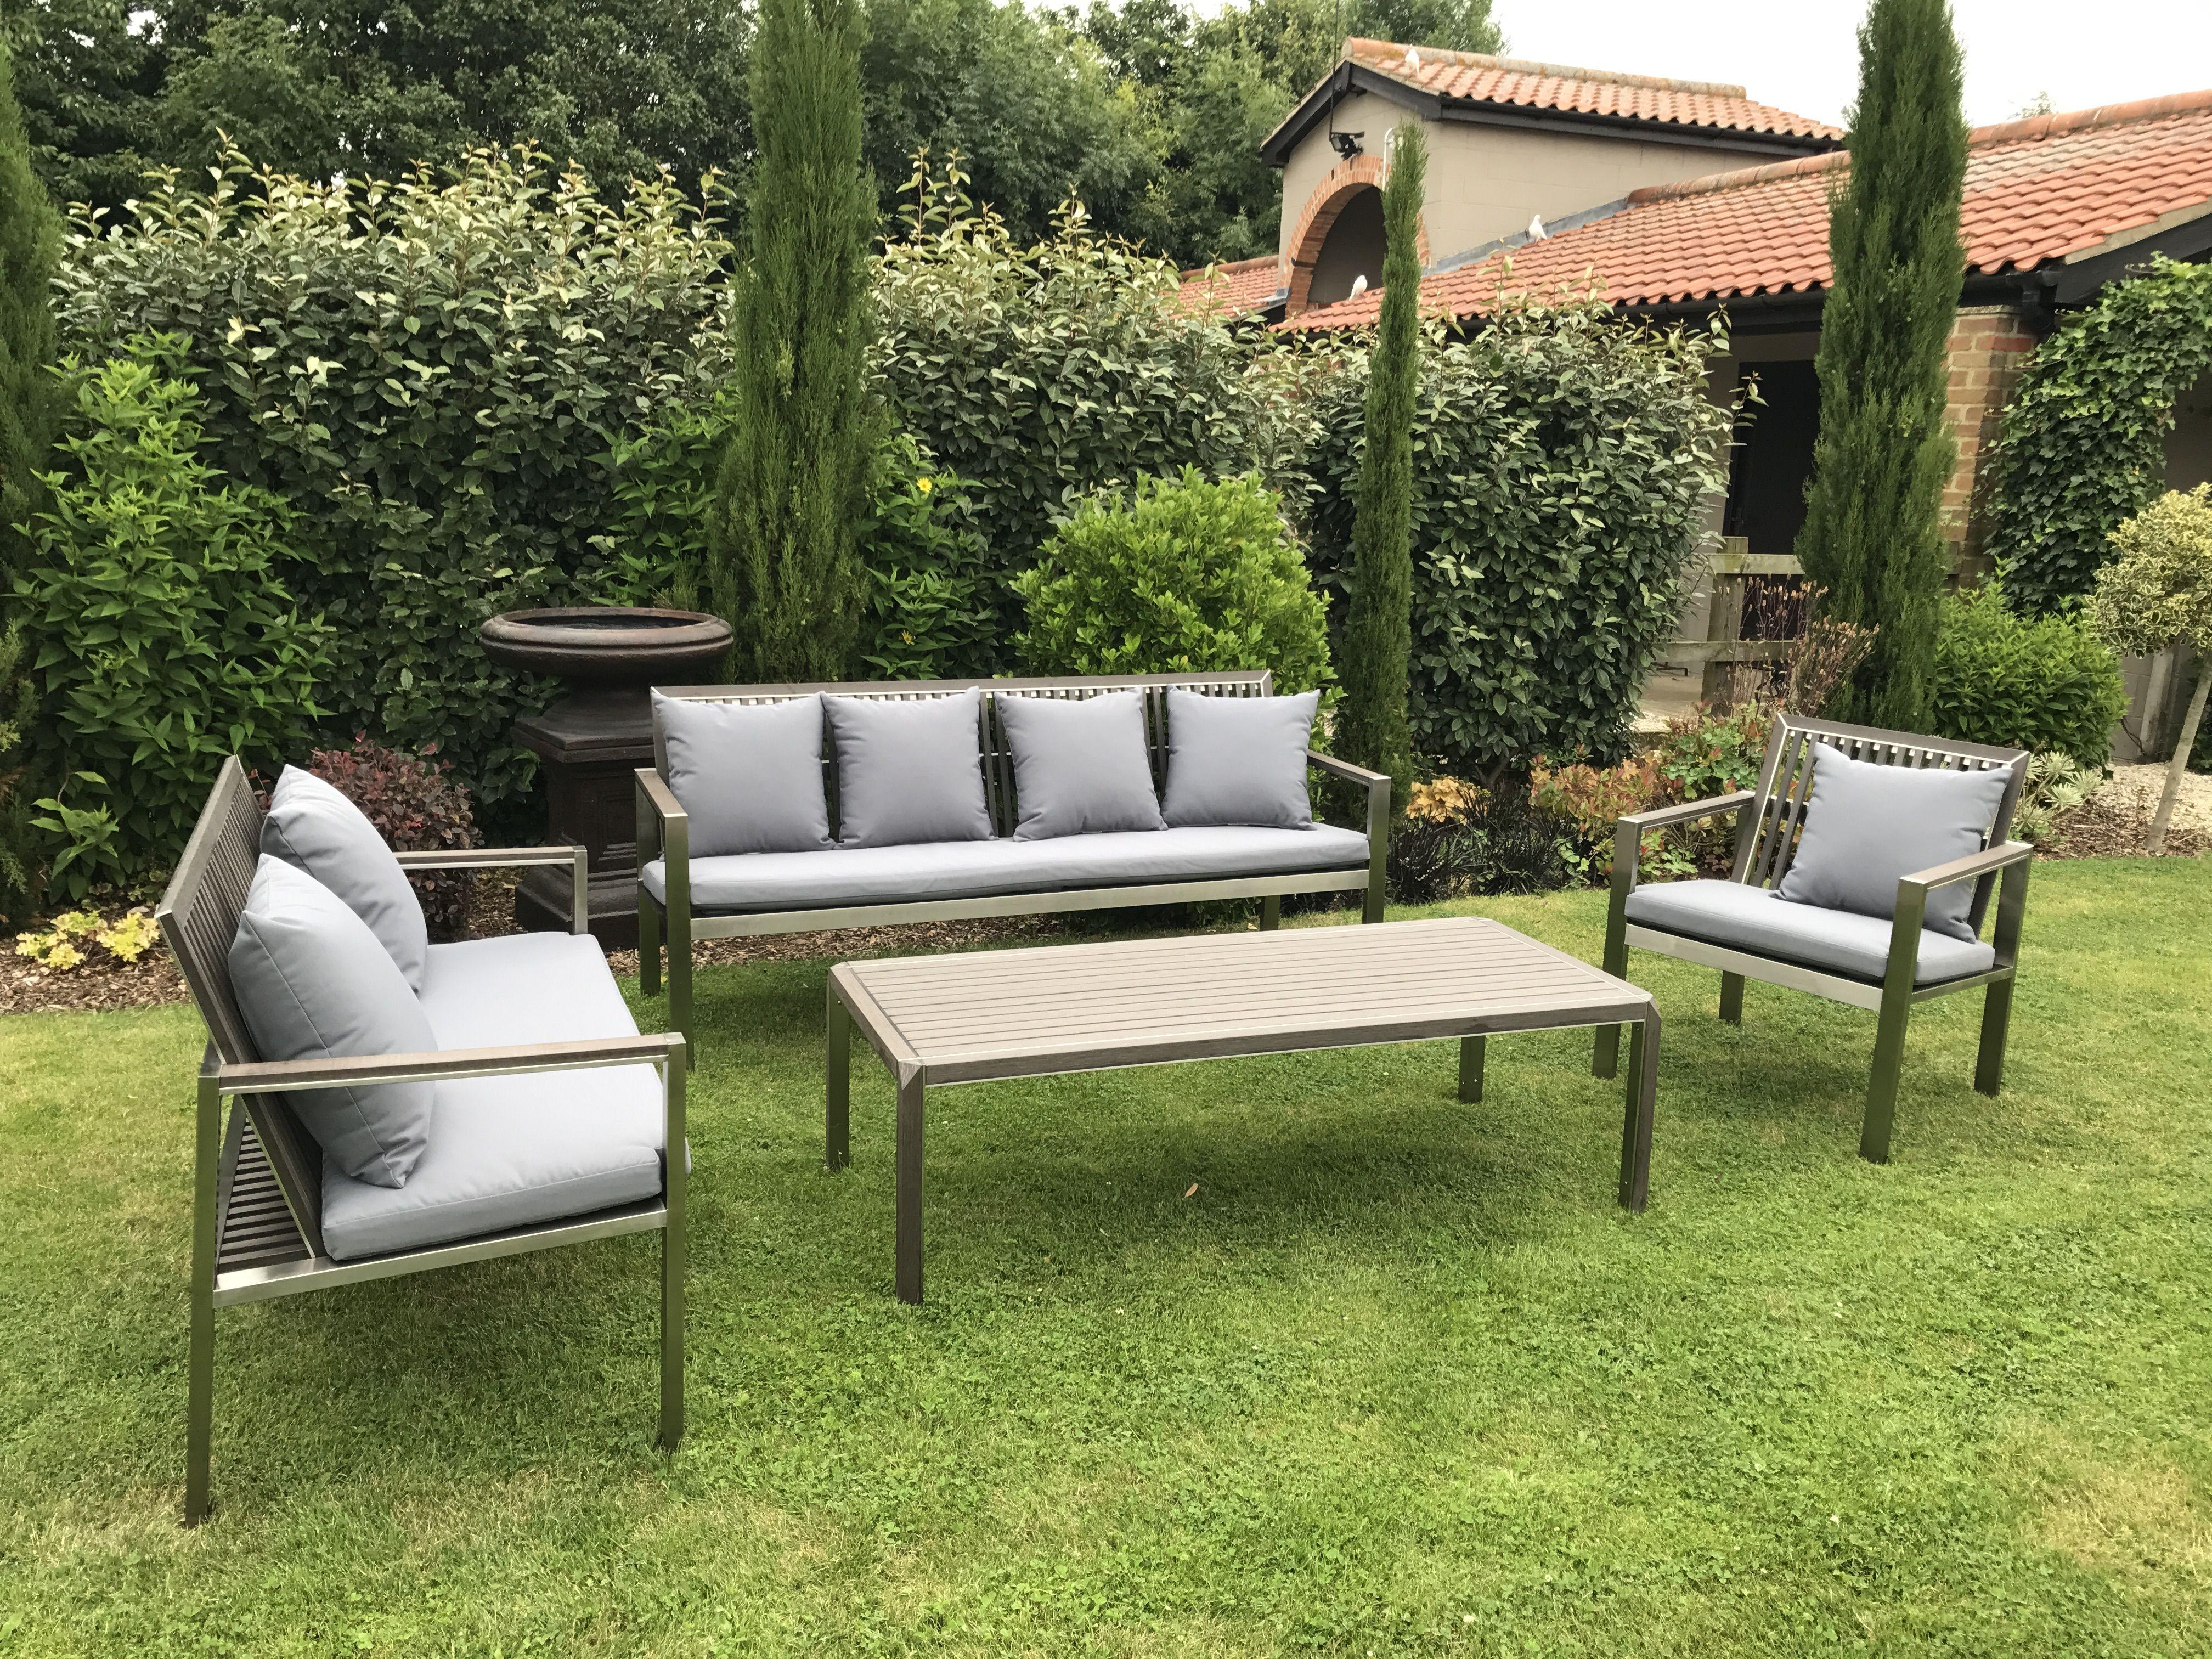 Amazing Foremost Golde Set #garden #furniture #foremost #golde